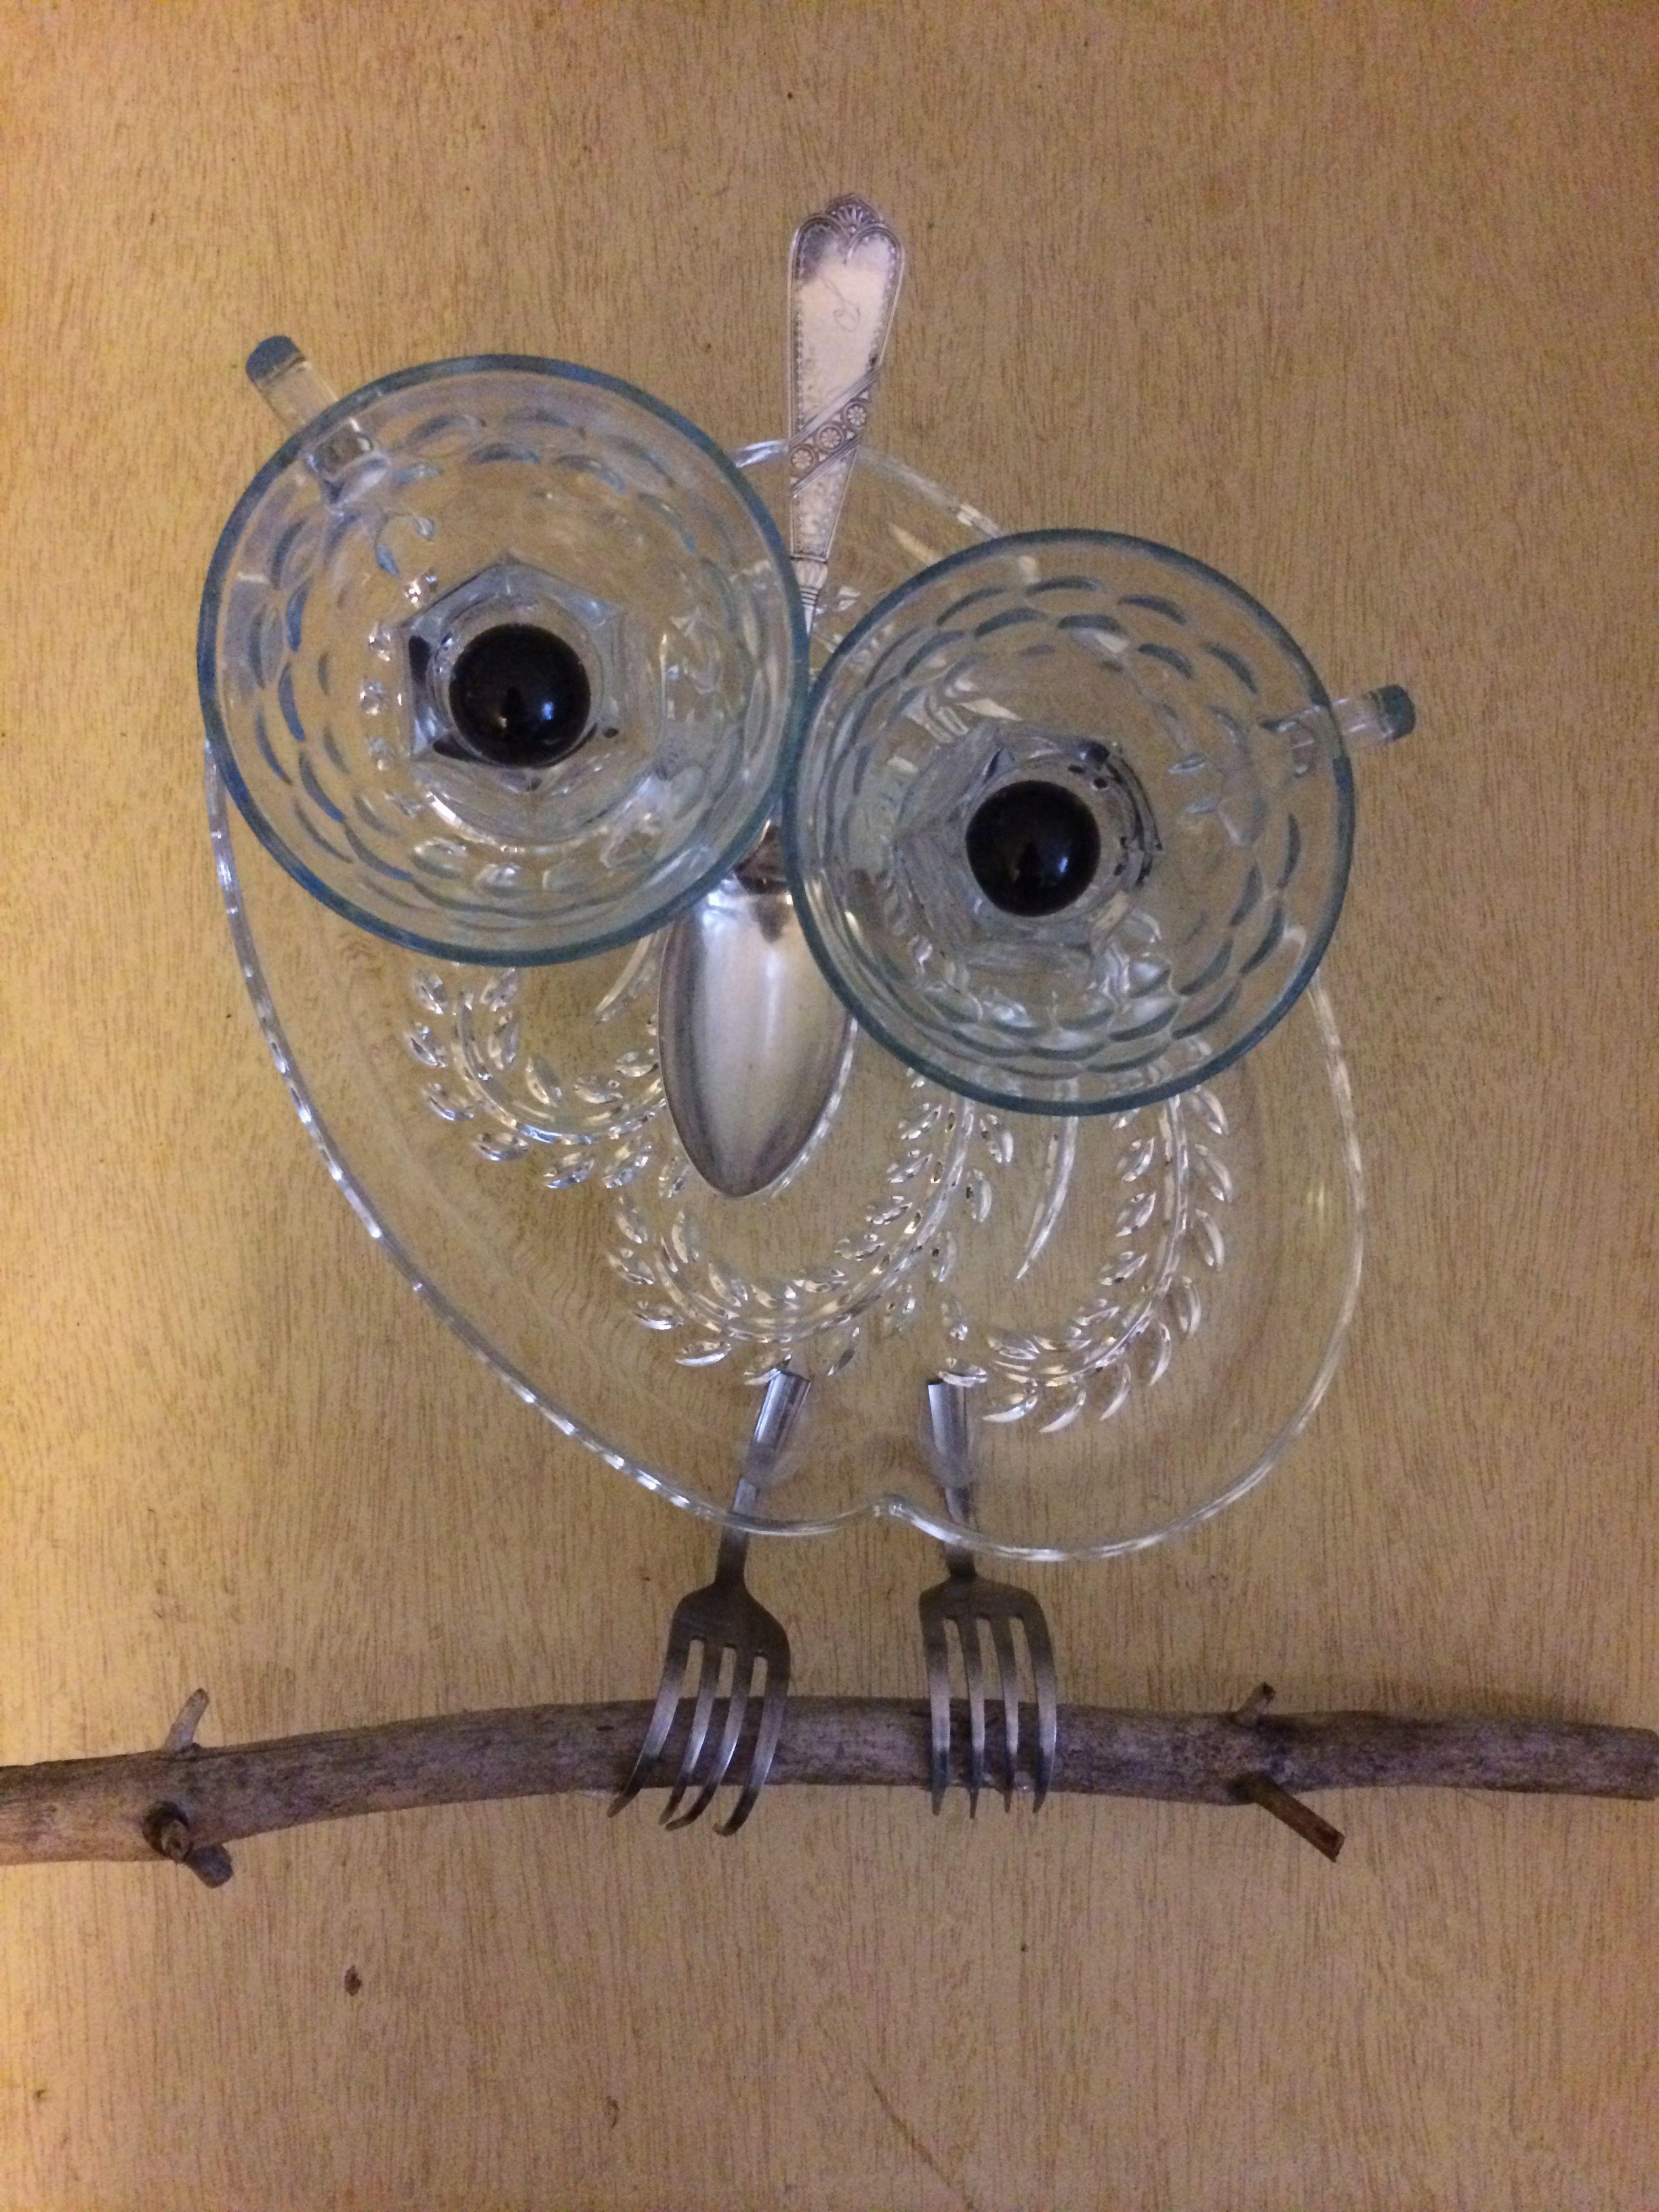 Available - Owl garden art/suncatcher by tambrey the Repurposer - 165